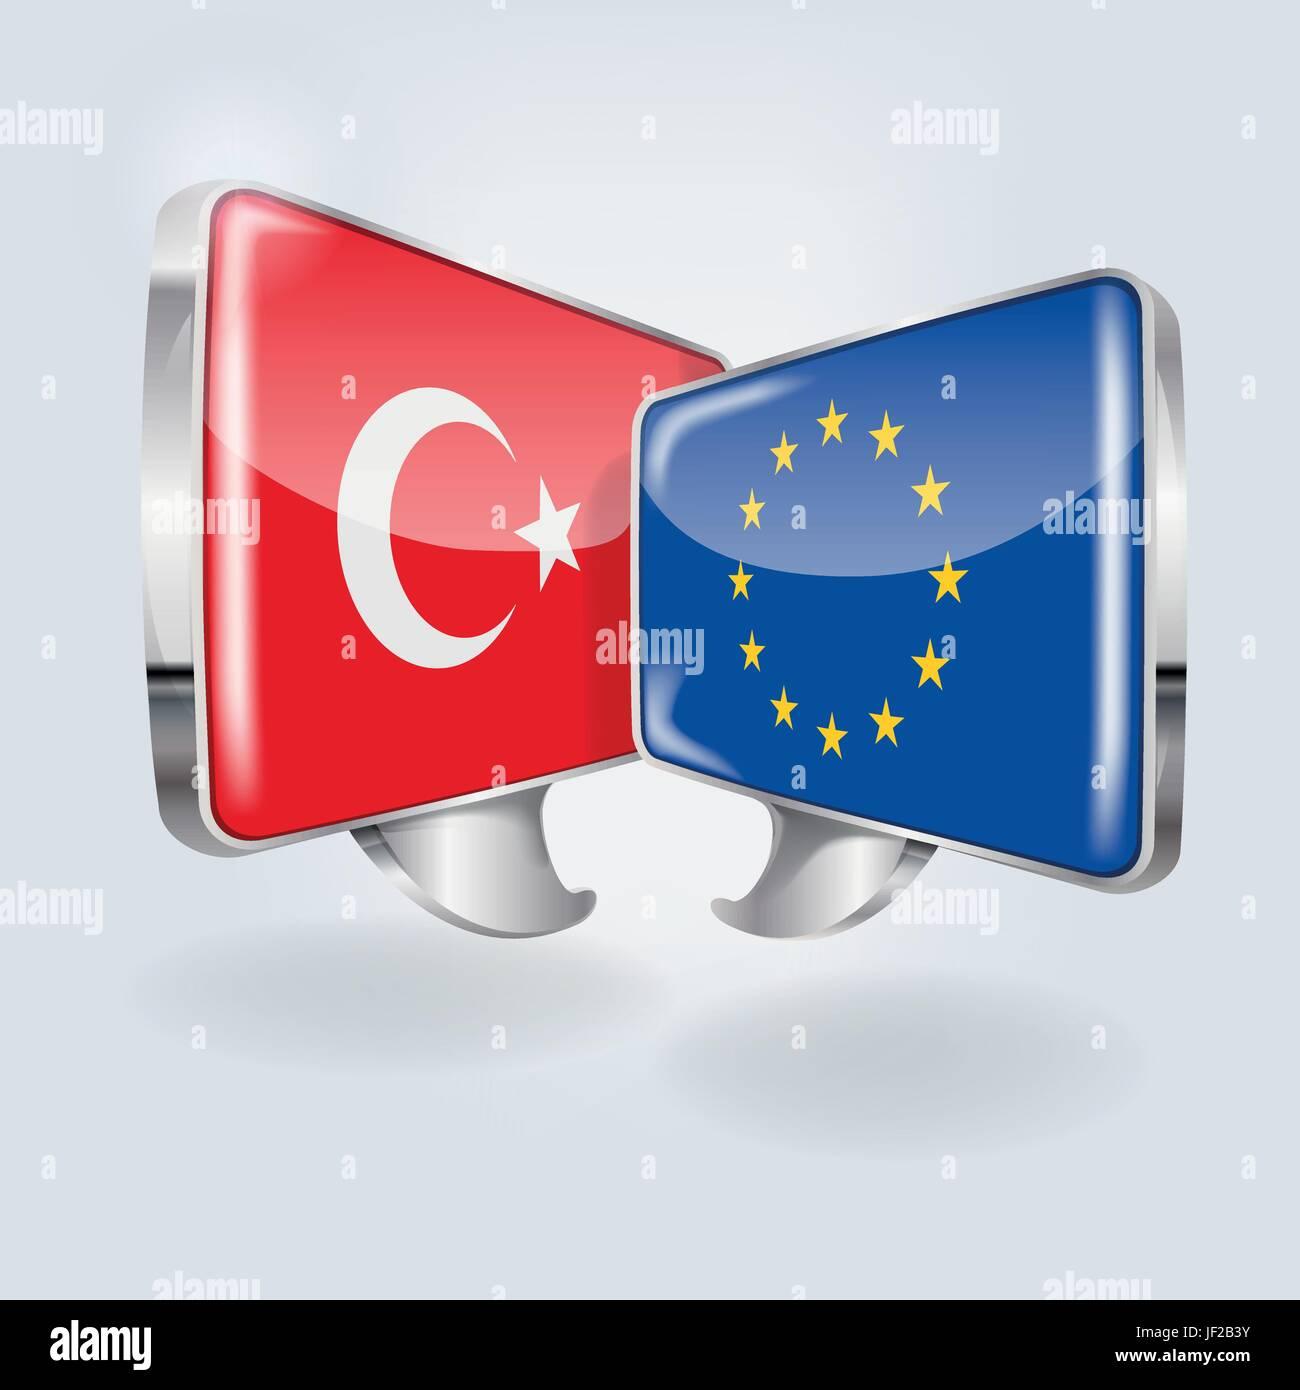 european, caucasian, europe, turkey, collaboration, cooperation, community, - Stock Image